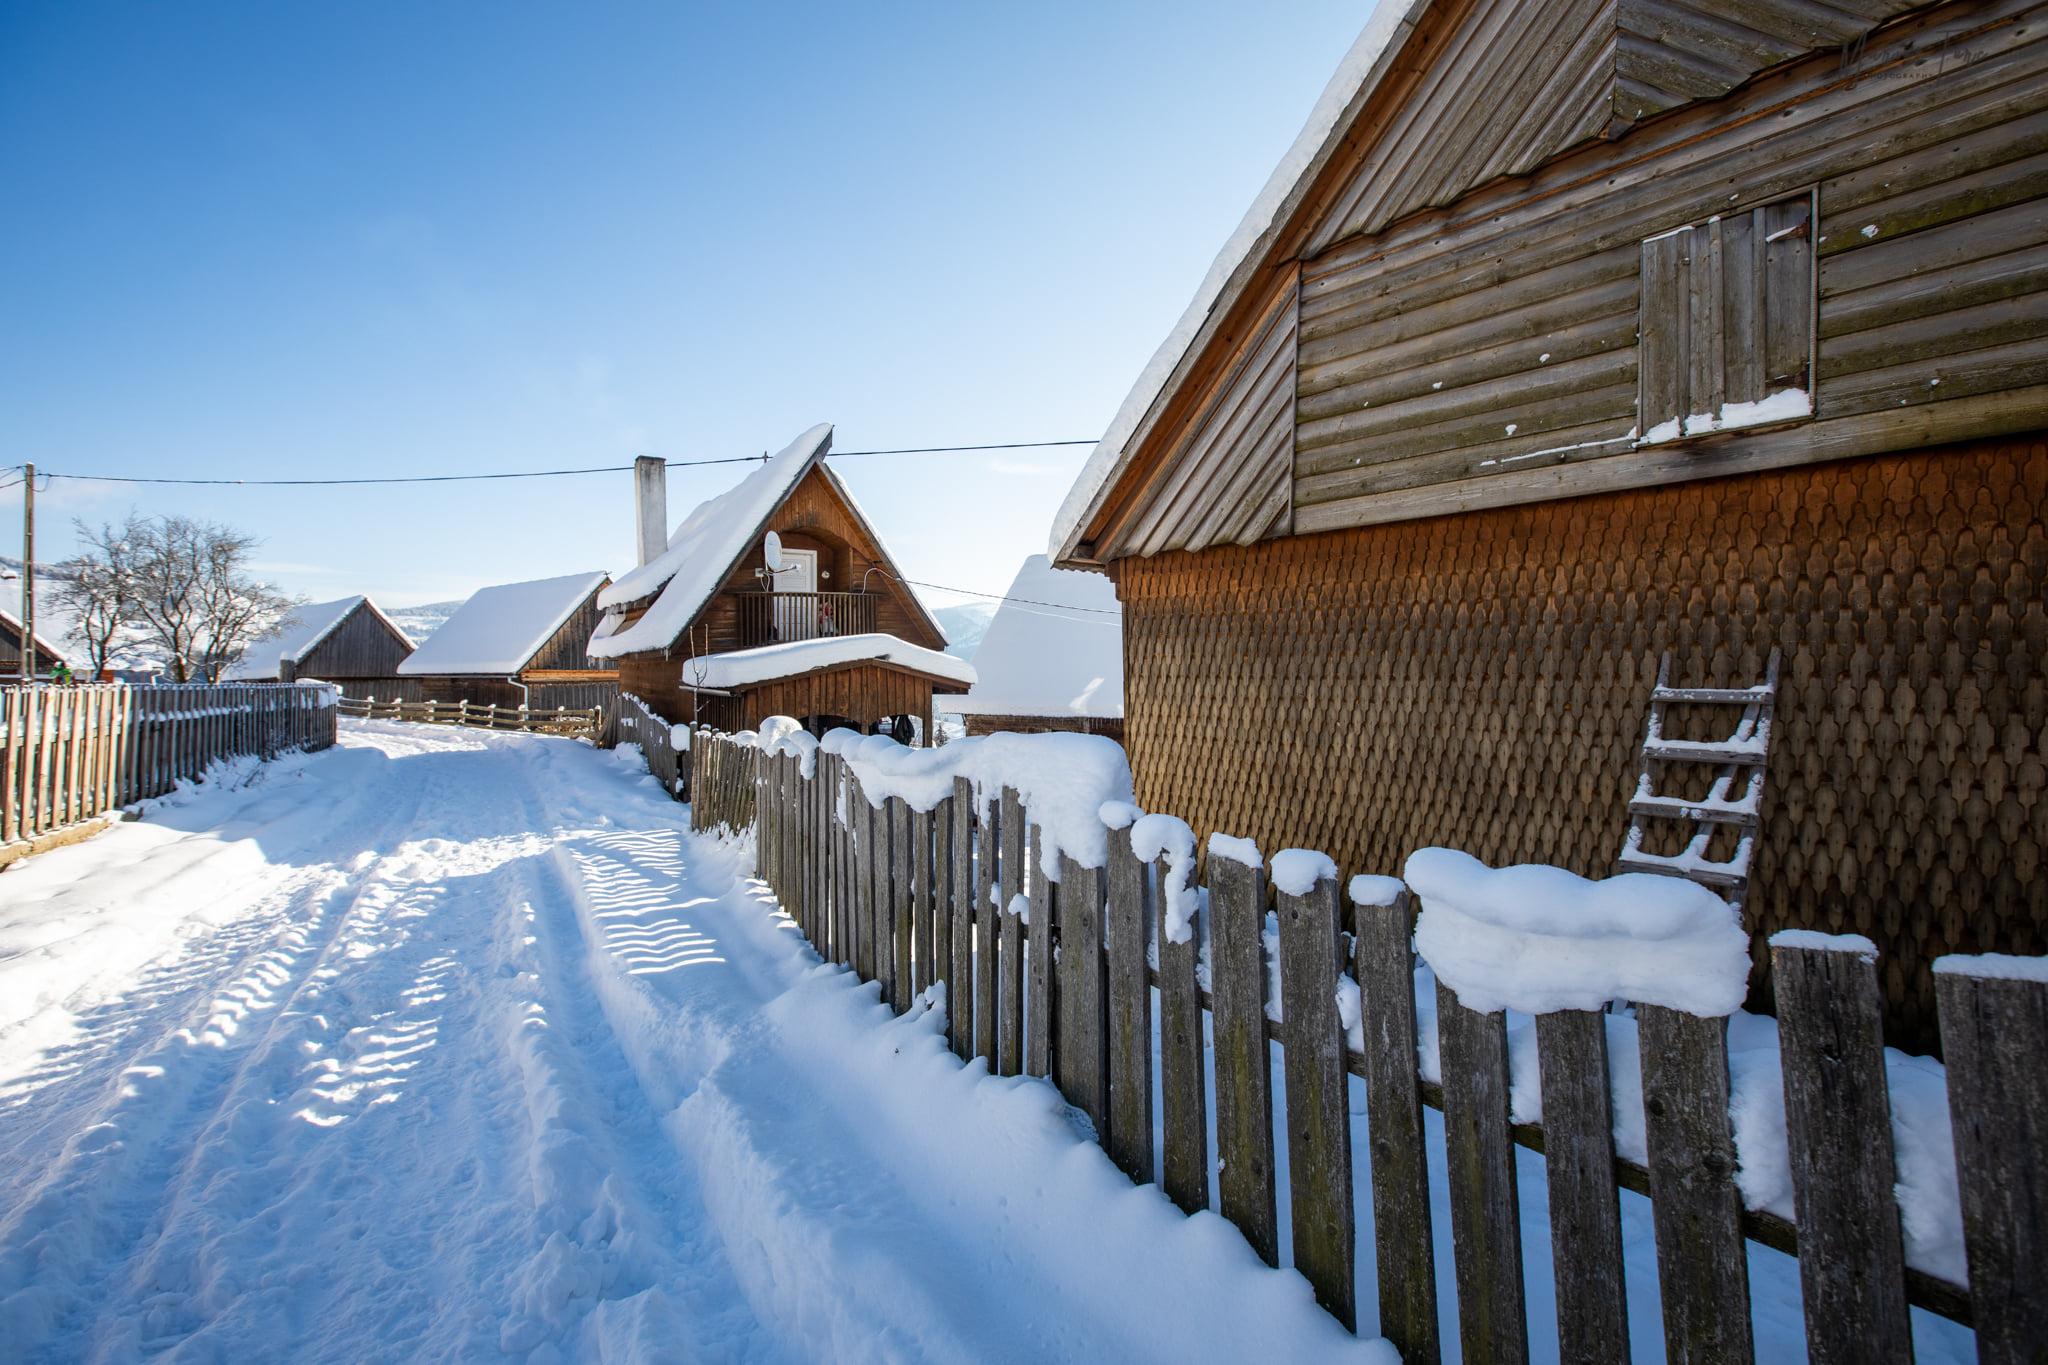 Iarna faina sus la moti - Marius Turc